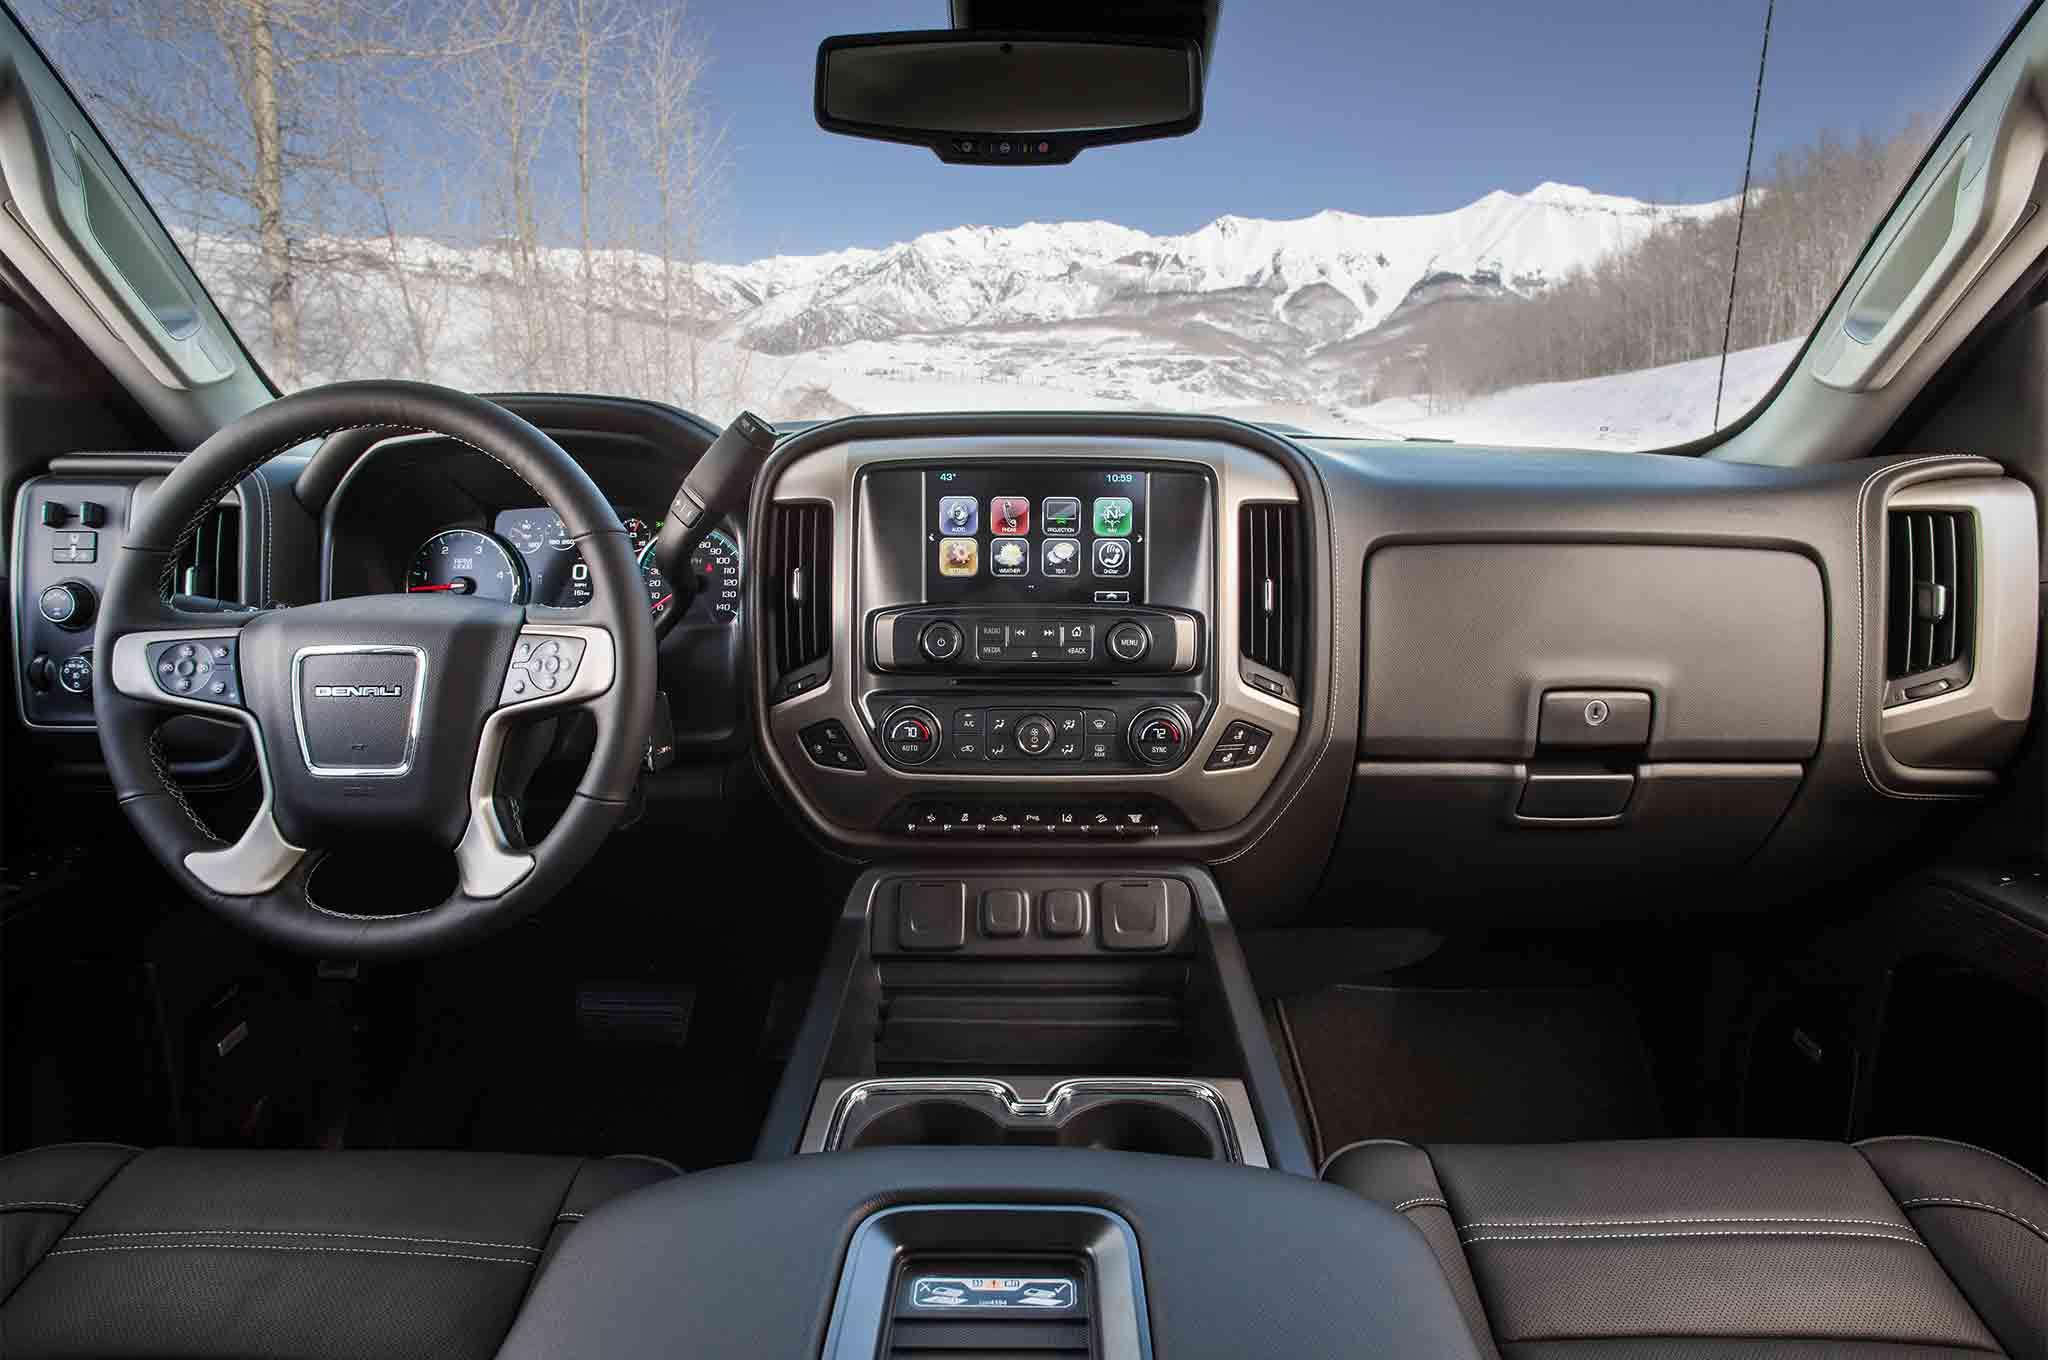 2017 GMC Sierra 2500 and 3500 Denali HD Duramax Review %%sep% Automobile Magazine